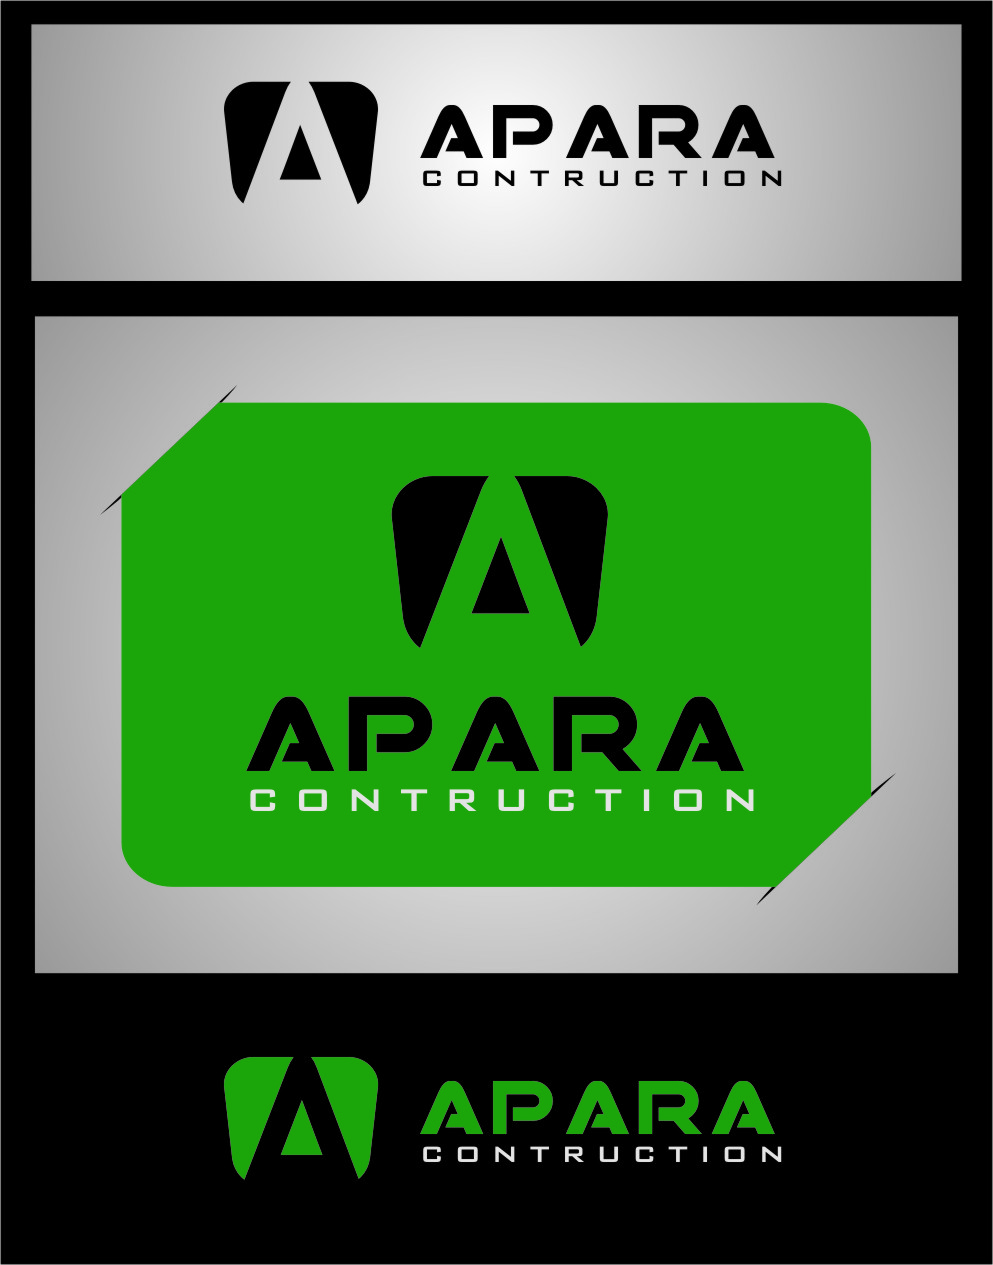 Logo Design by Ngepet_art - Entry No. 190 in the Logo Design Contest Apara Construction Logo Design.